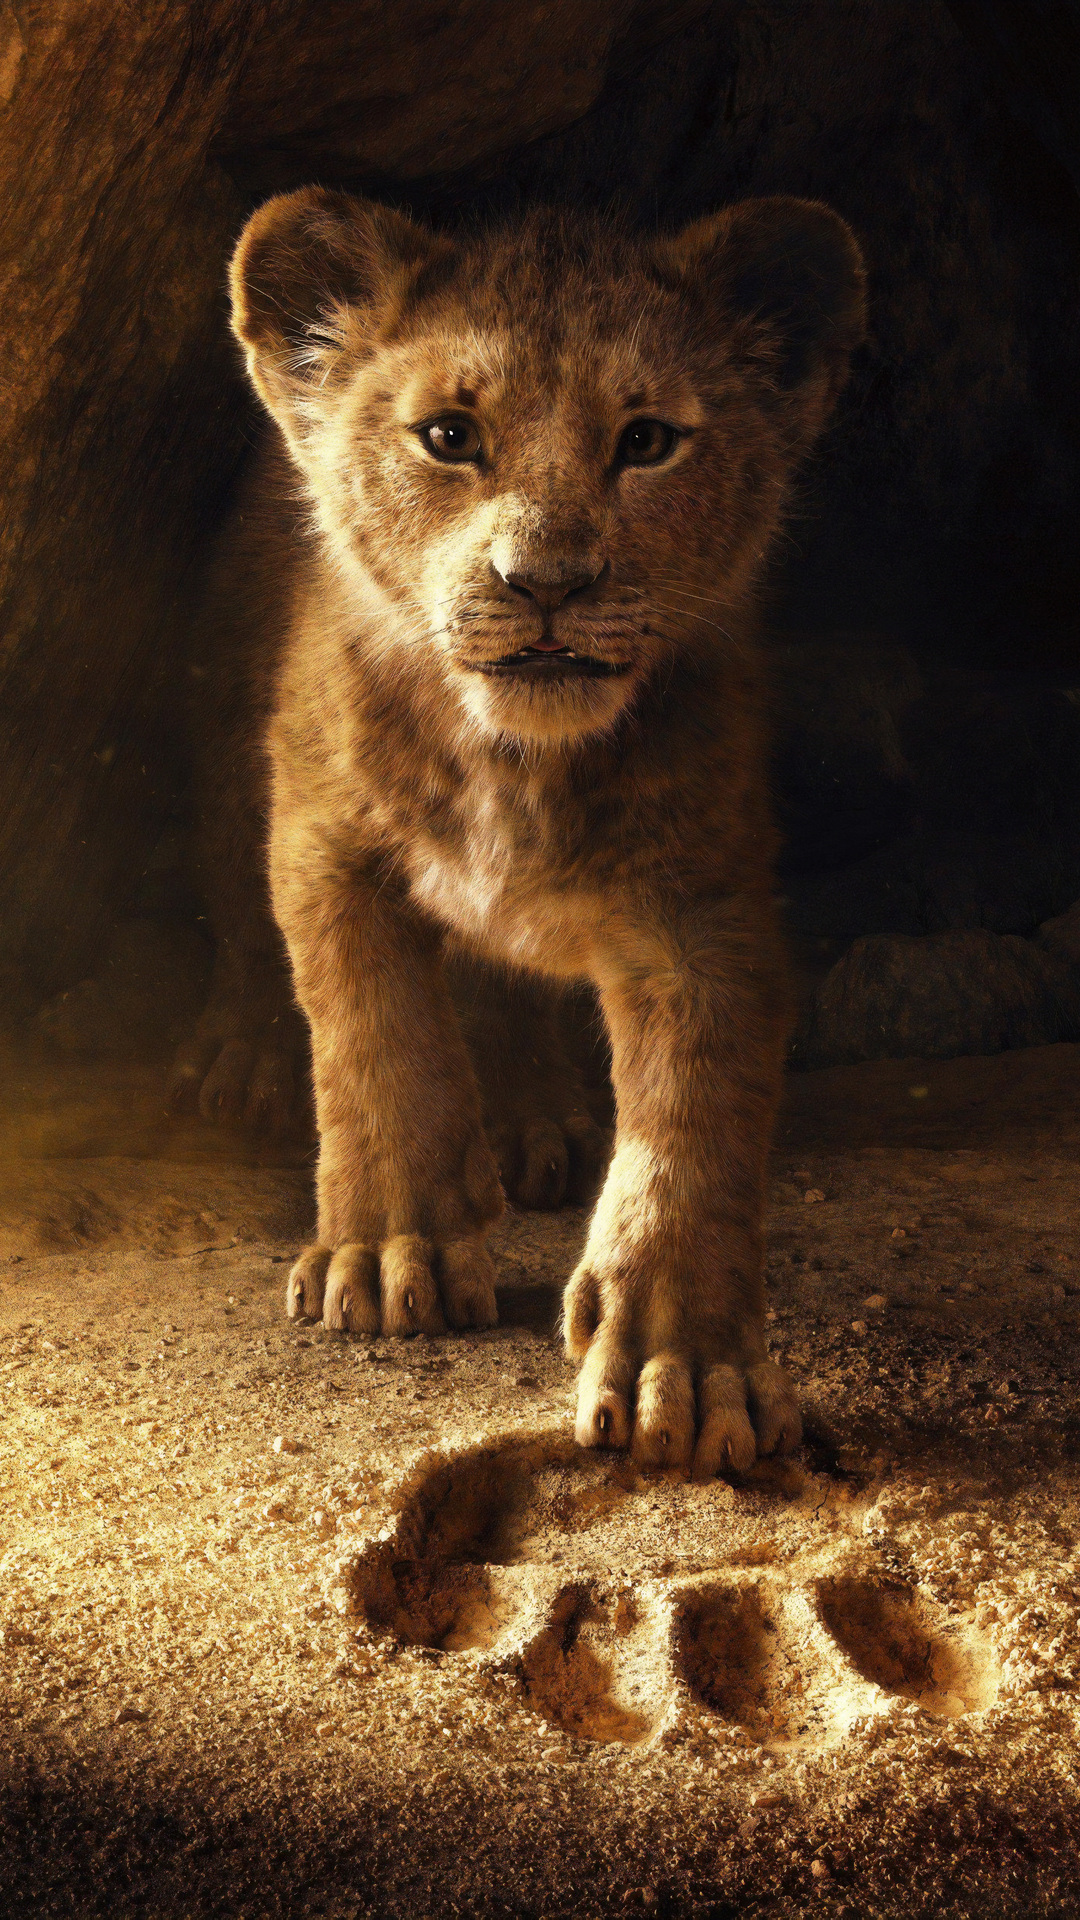 1080x1920 The Lion King 2019 Iphone 7 6s 6 Plus Pixel Xl One Plus